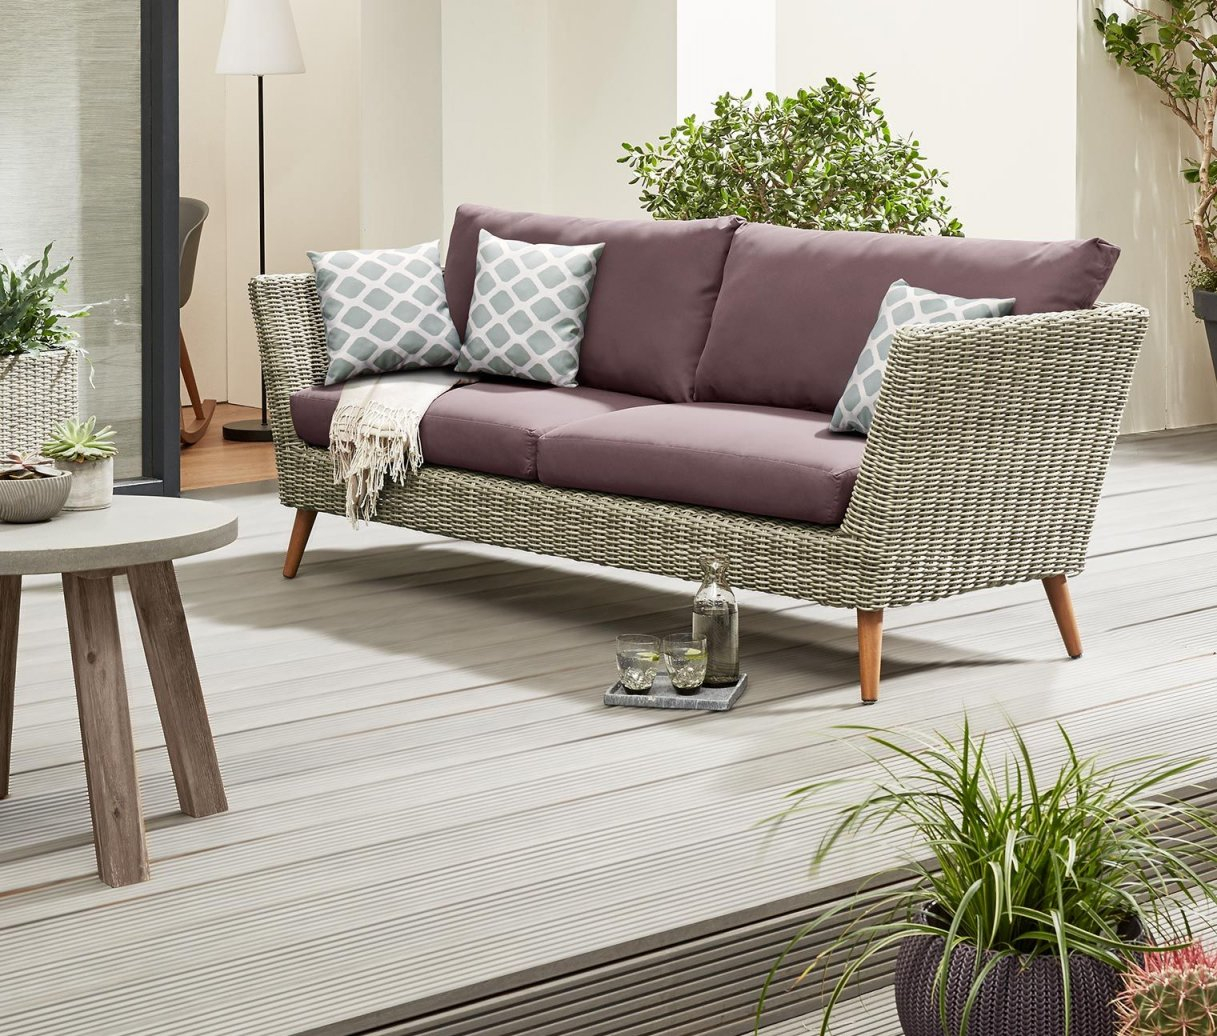 3 Sitzer Outdoor Sofa von Polyrattan Sofa 3 Sitzer Photo